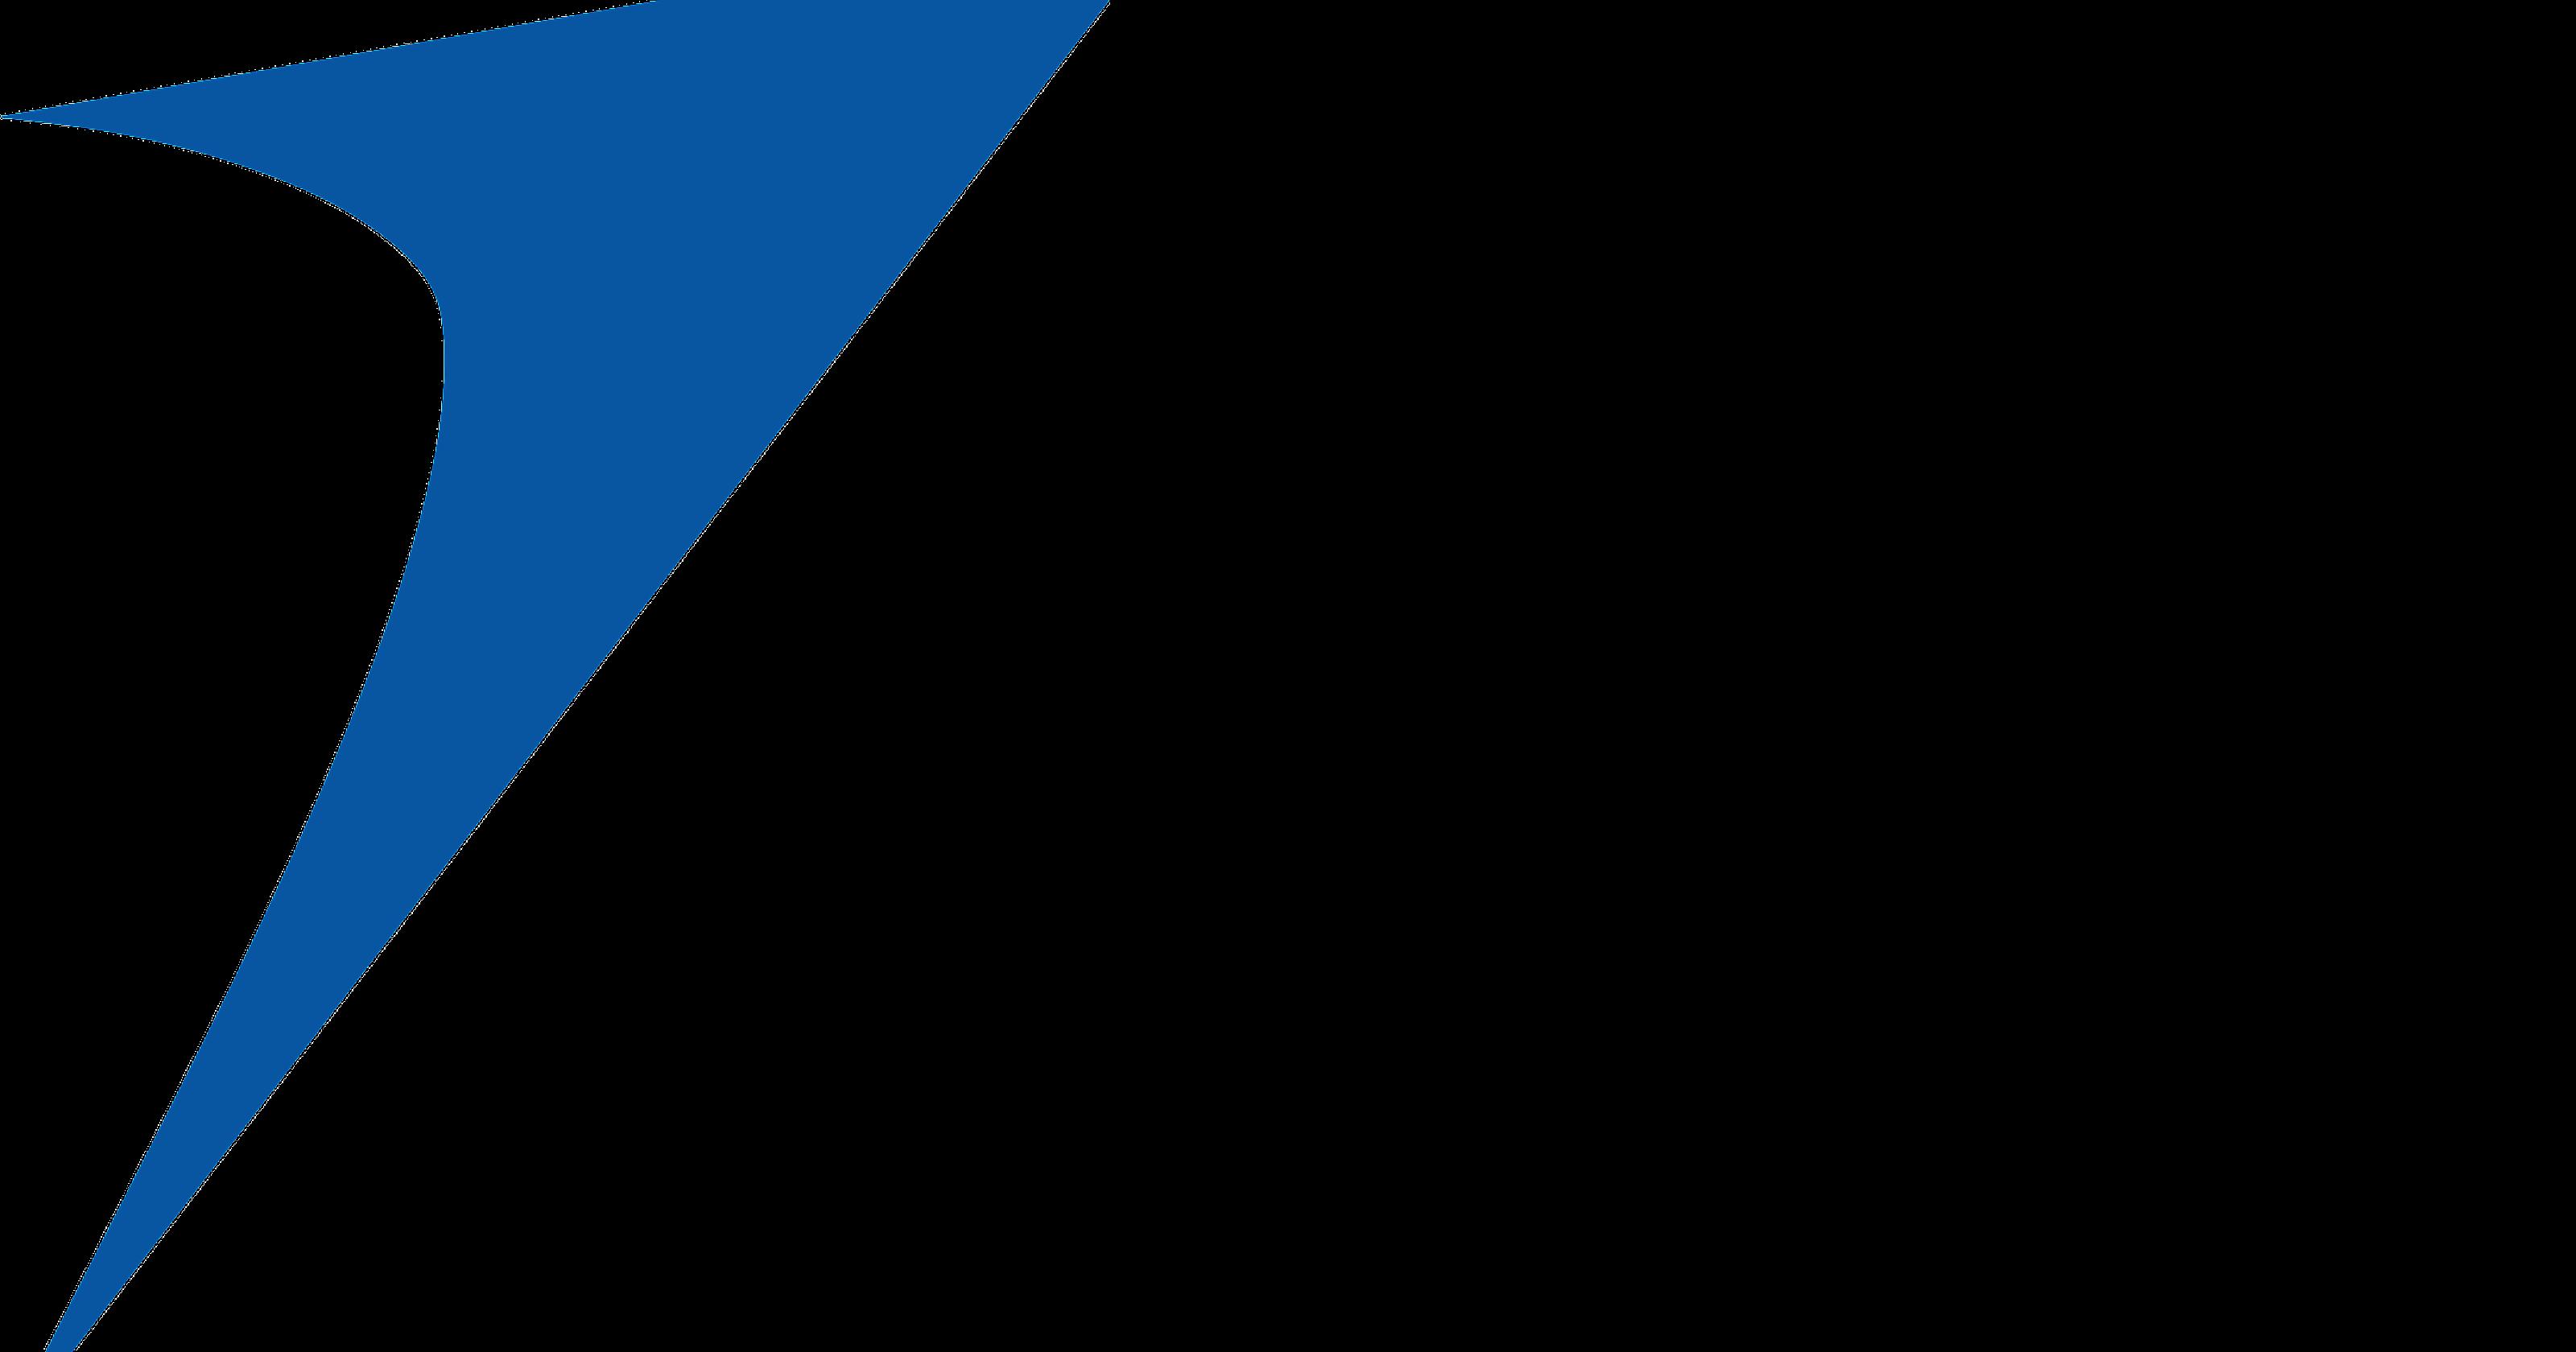 Madison gaining 70 jobs, $1.42M investment with Vertex.